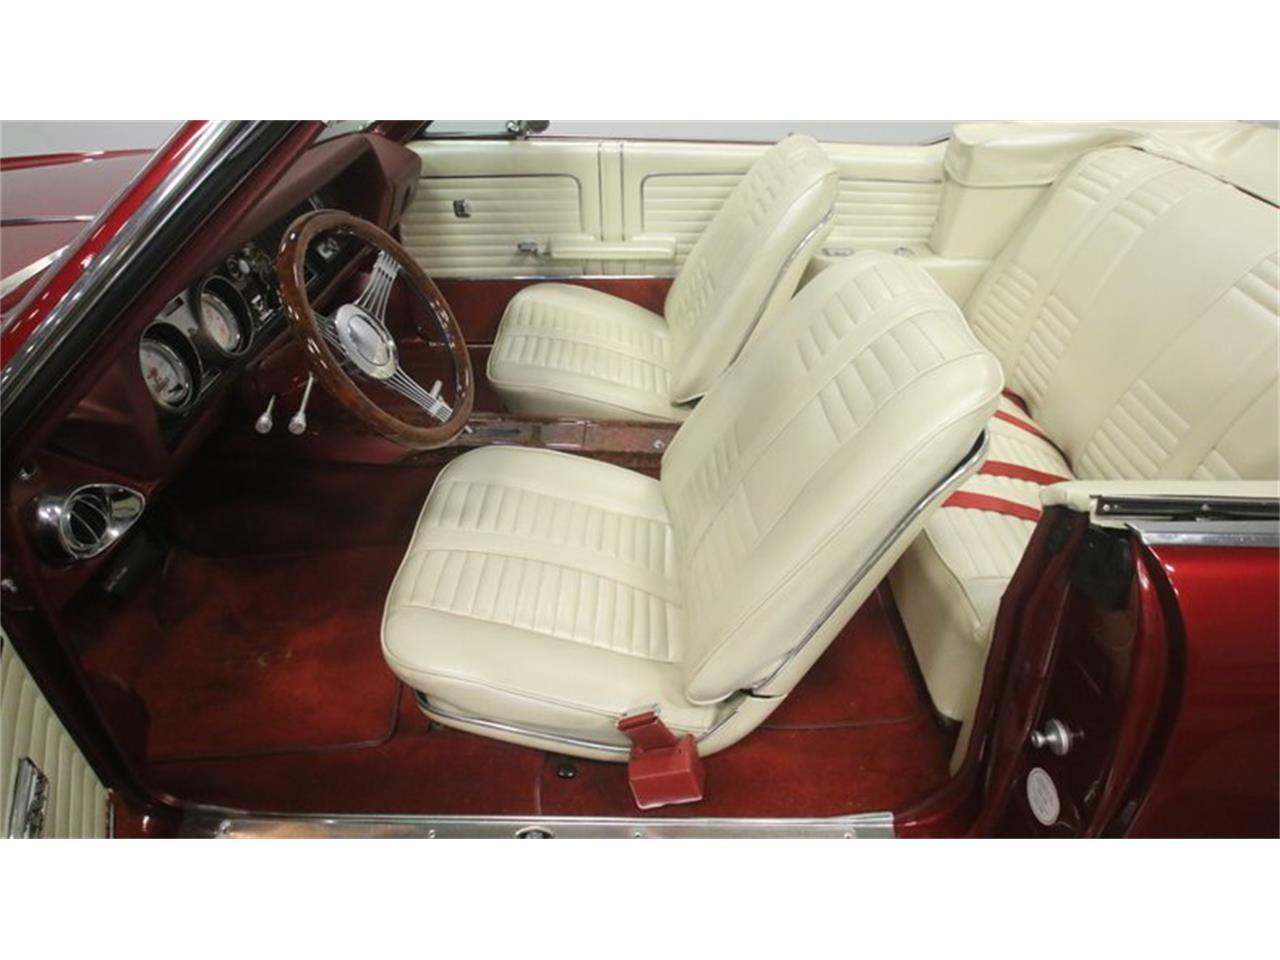 For Sale: 1966 Oldsmobile Cutlass in Lithia Springs, Georgia